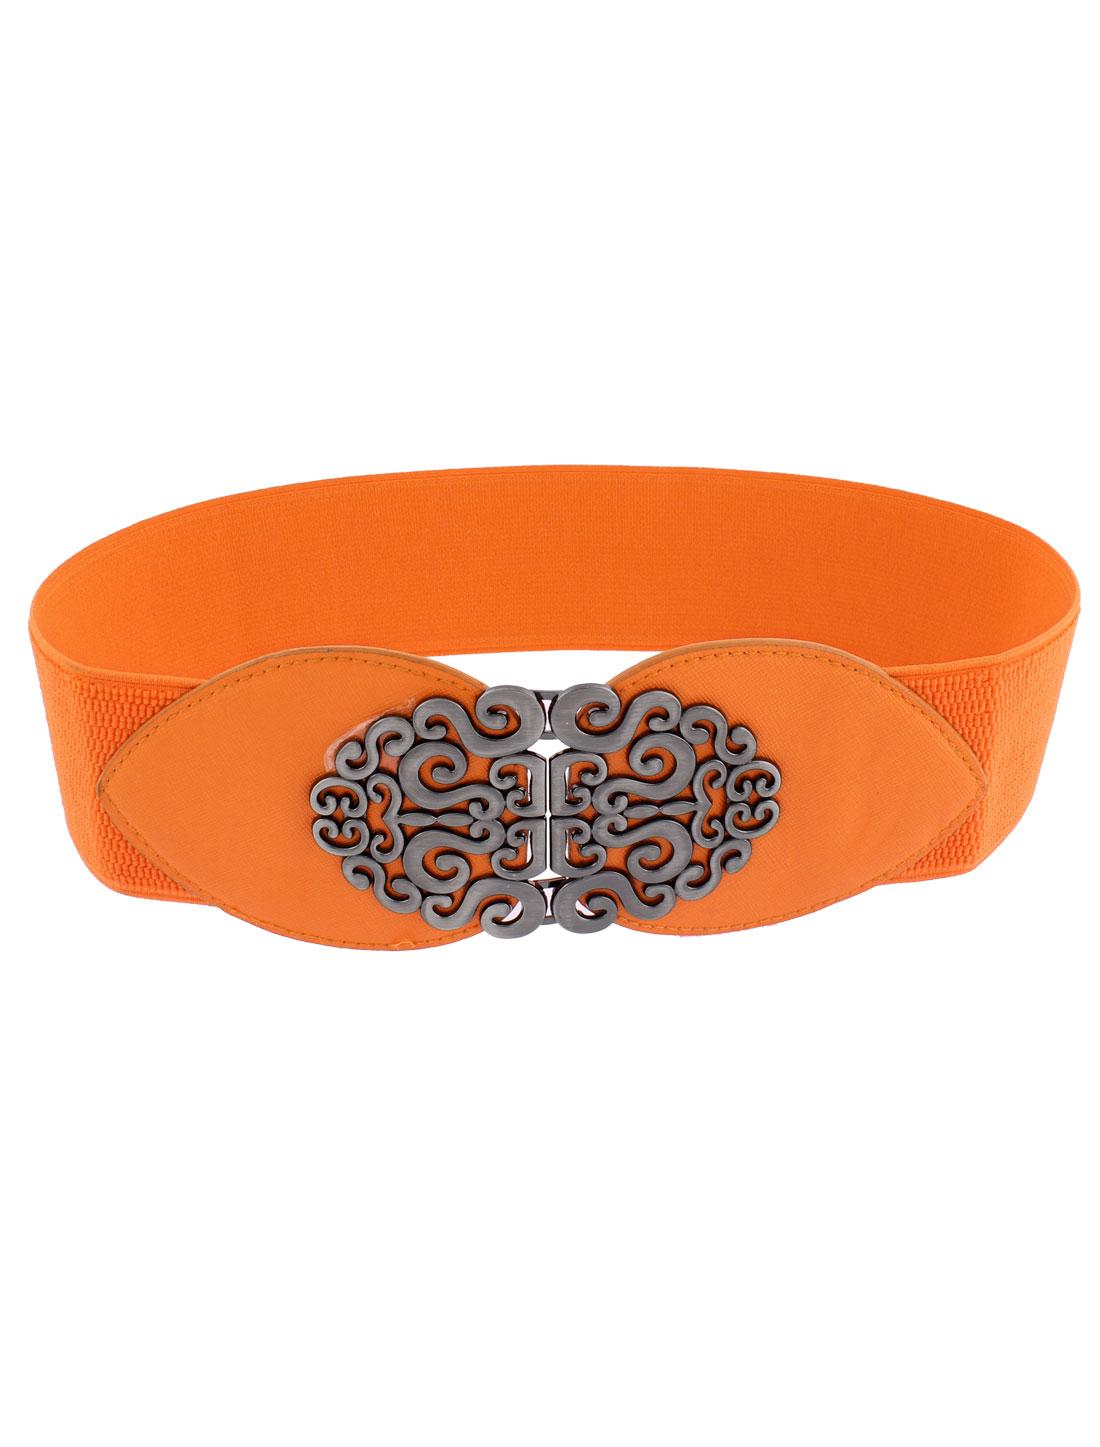 Wide Stretchy Elastic Corset Waist Belt Waistband Orange